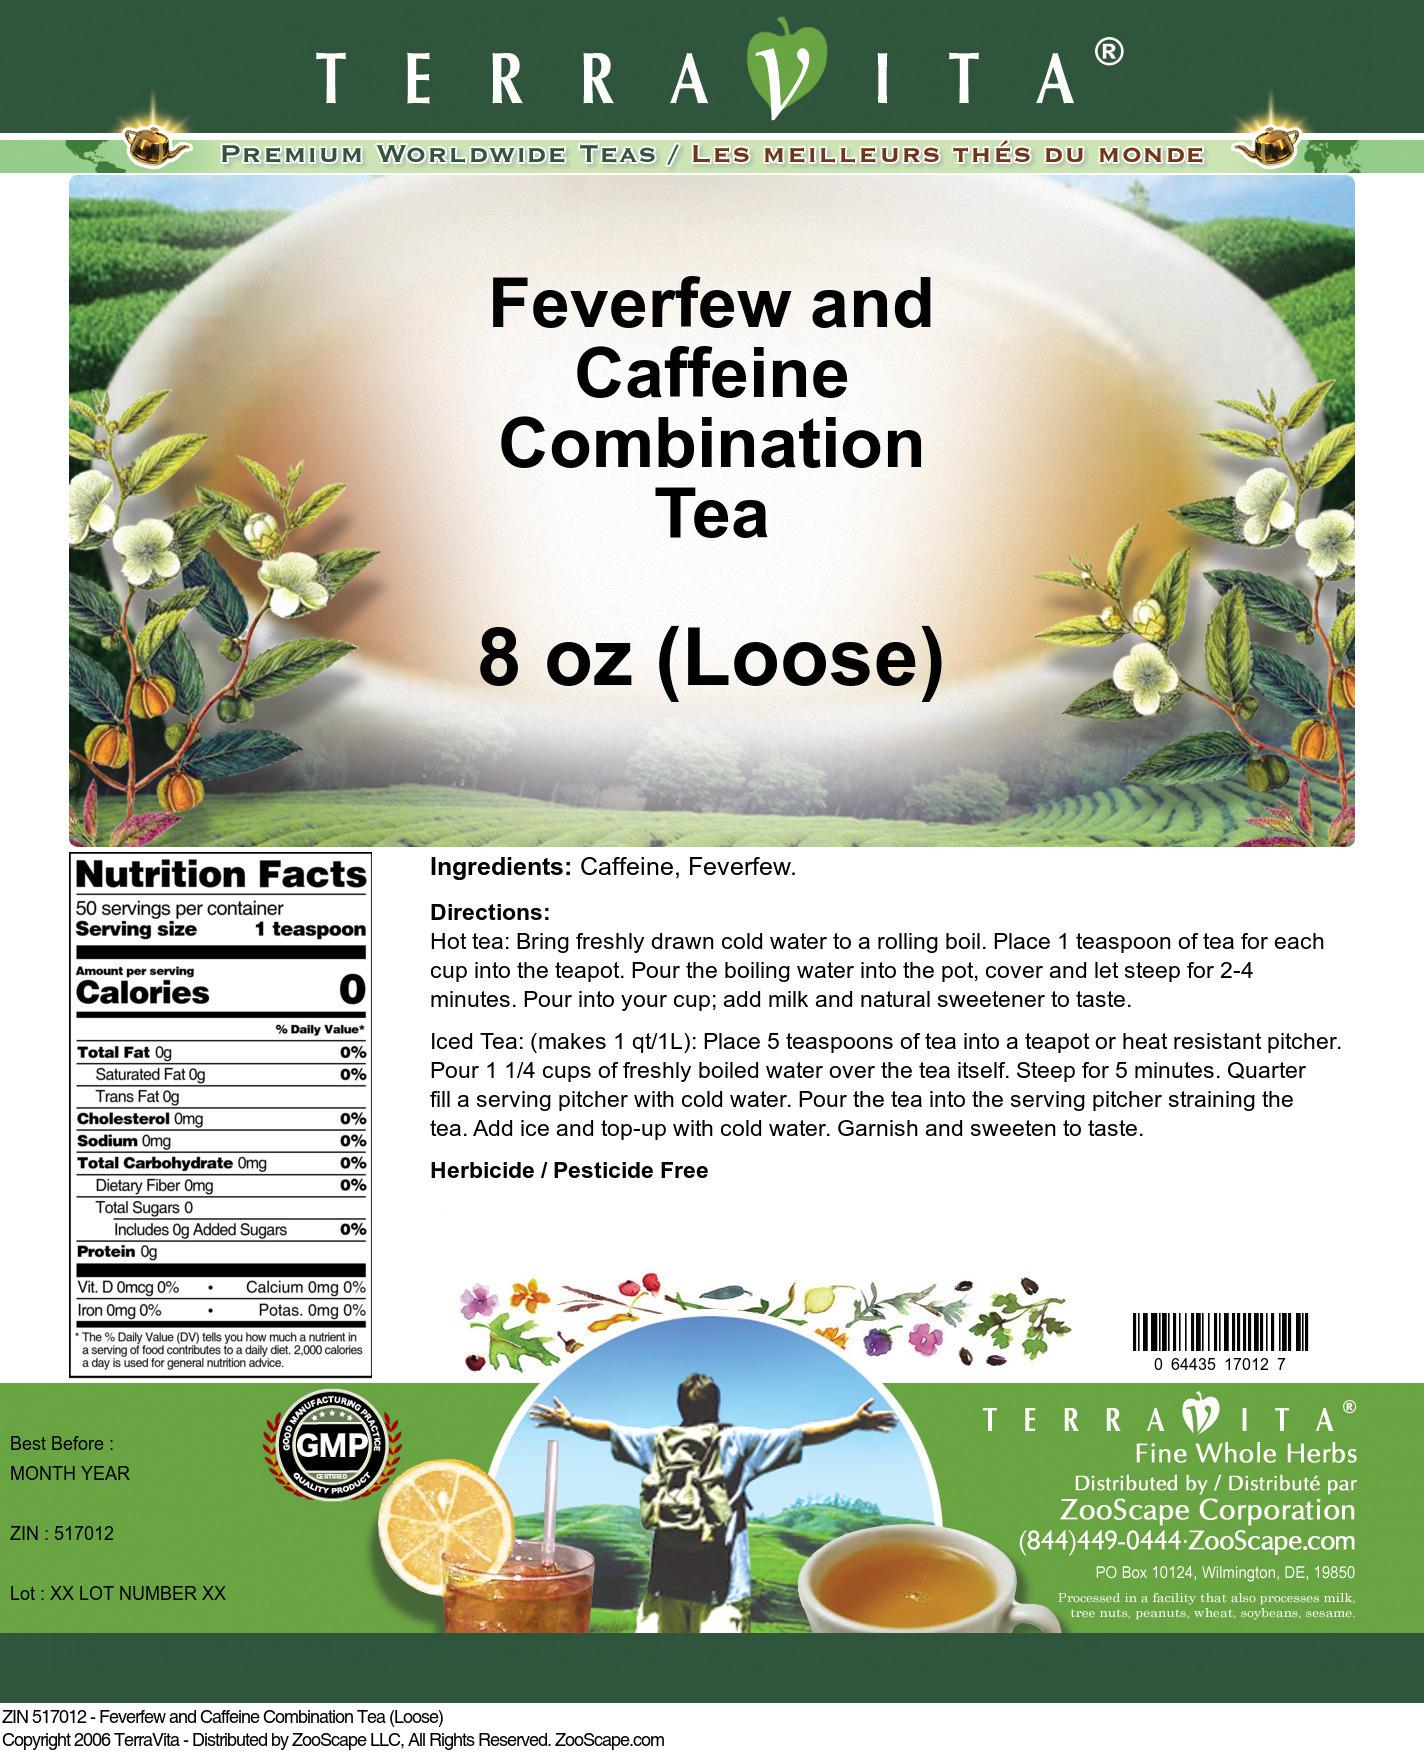 Feverfew and Caffeine Combination Tea (Loose)